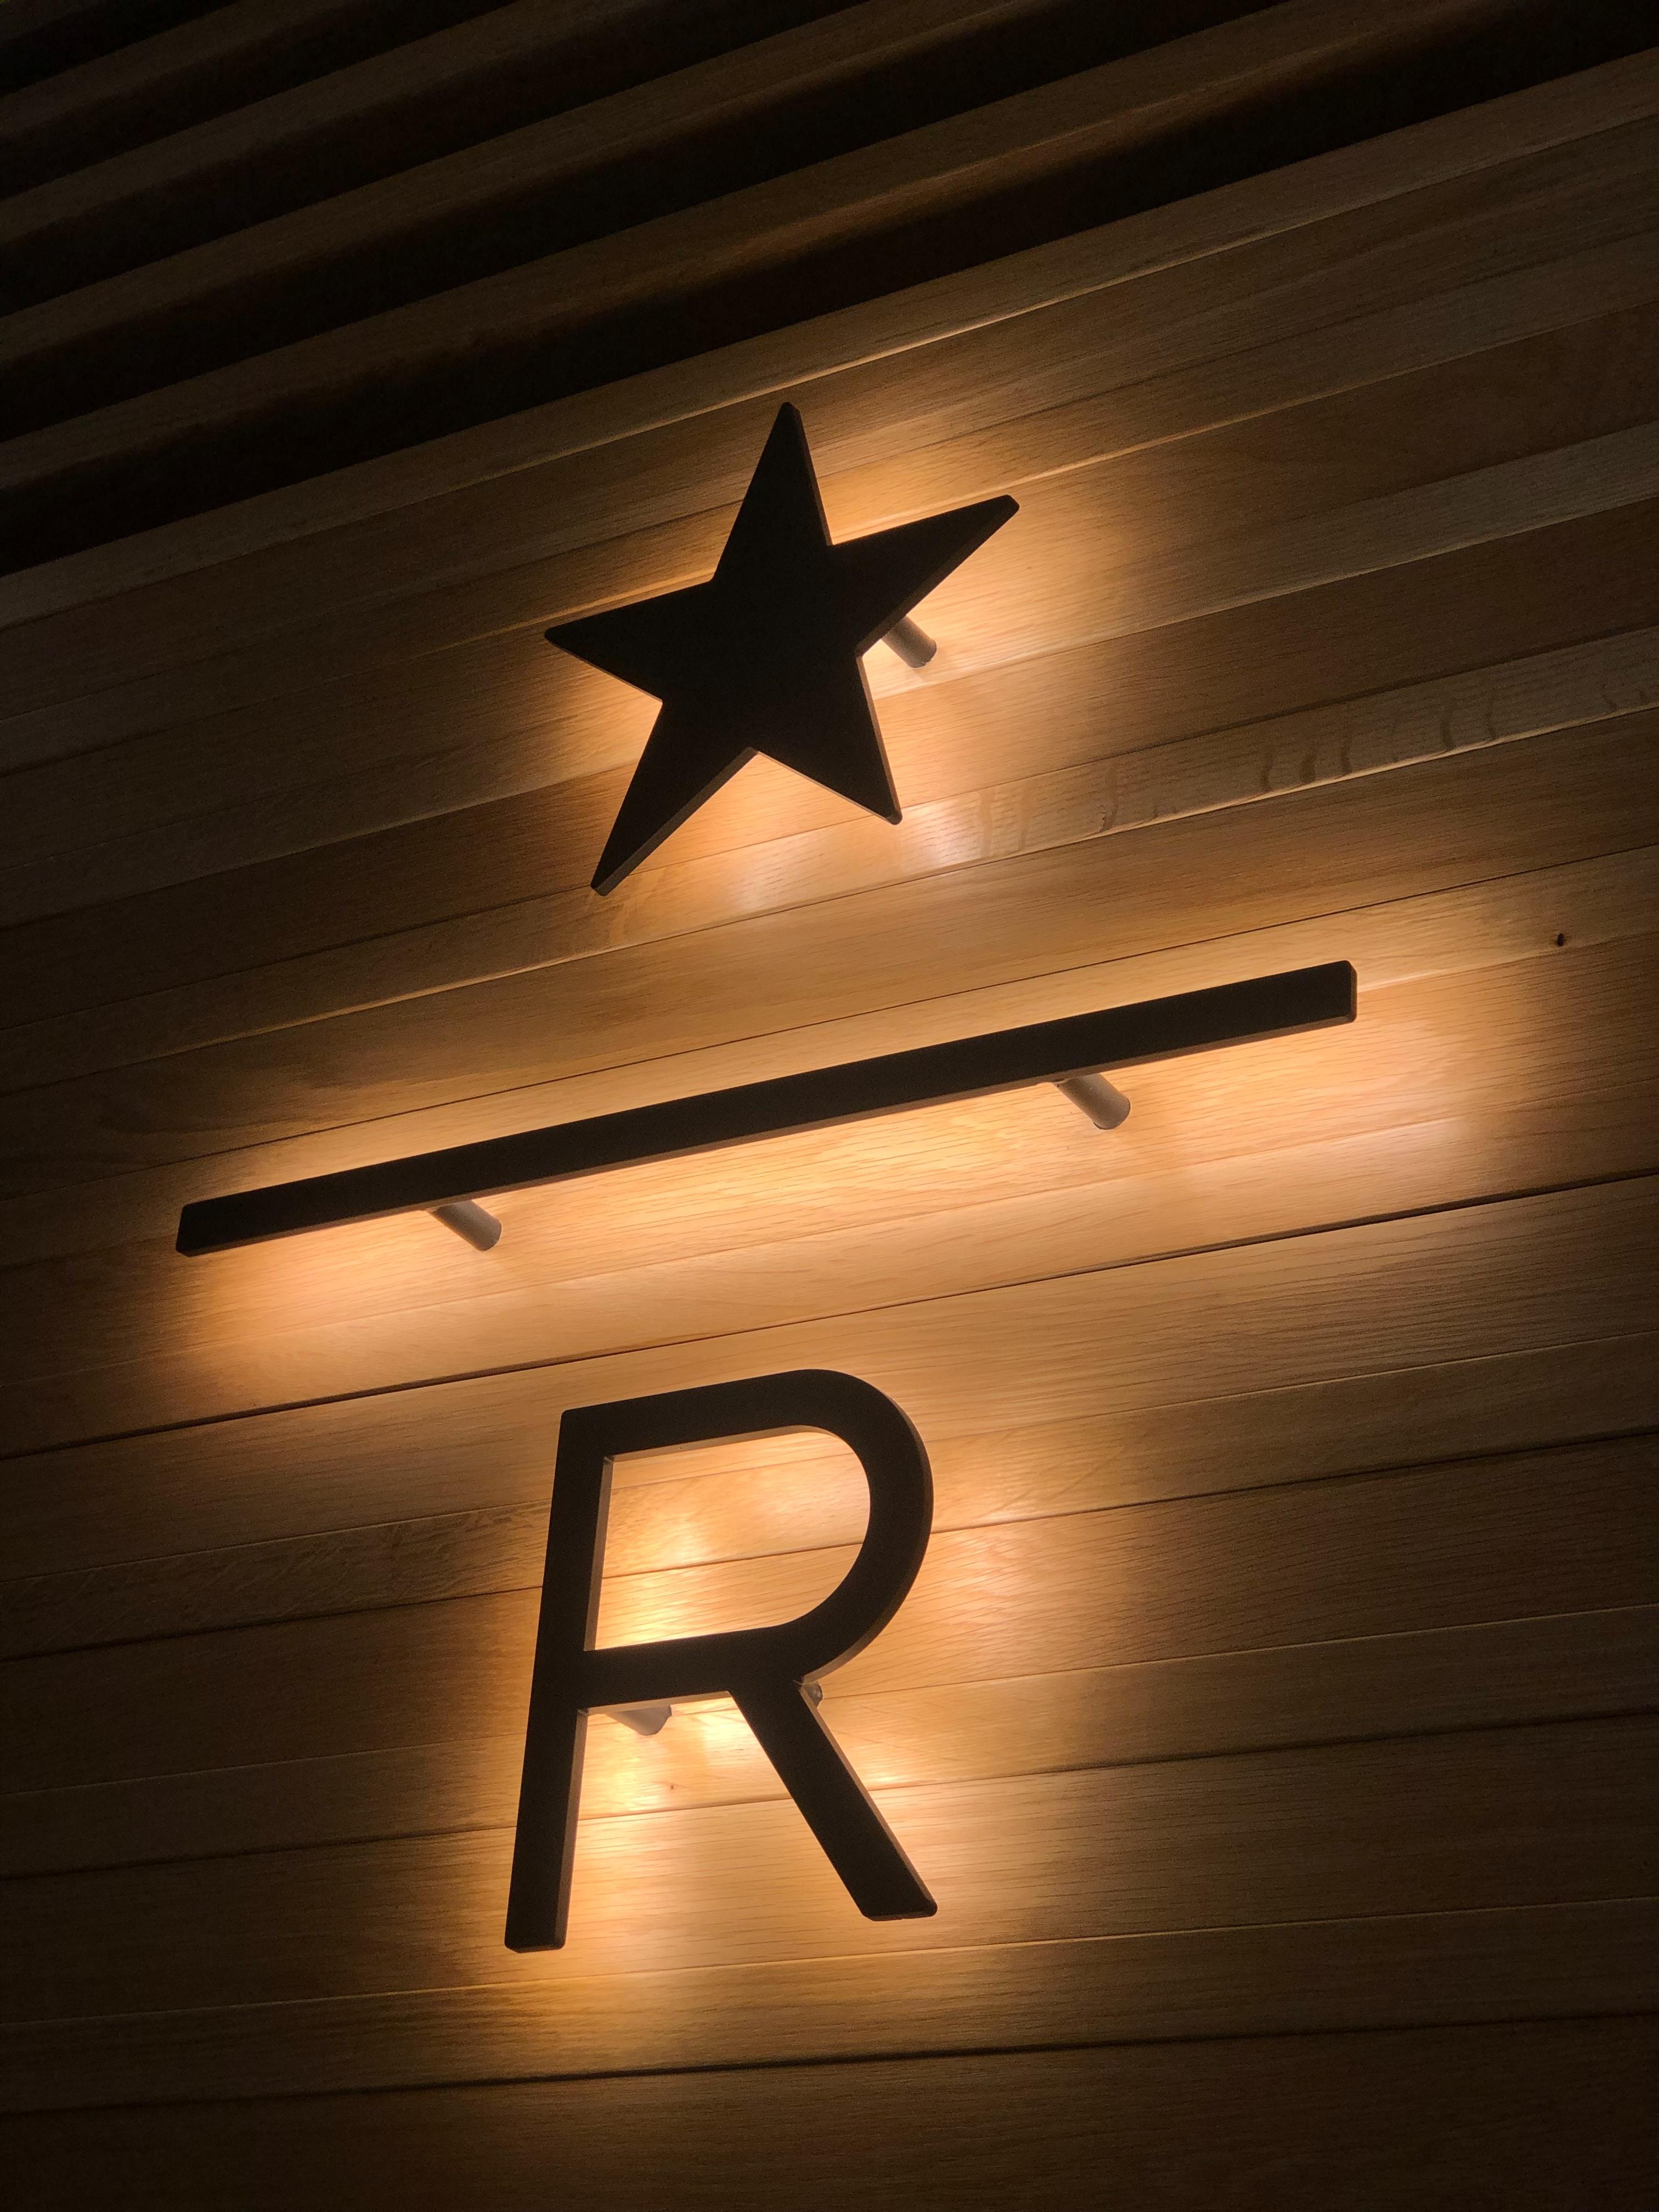 Starbucks reserve logo brand equity example